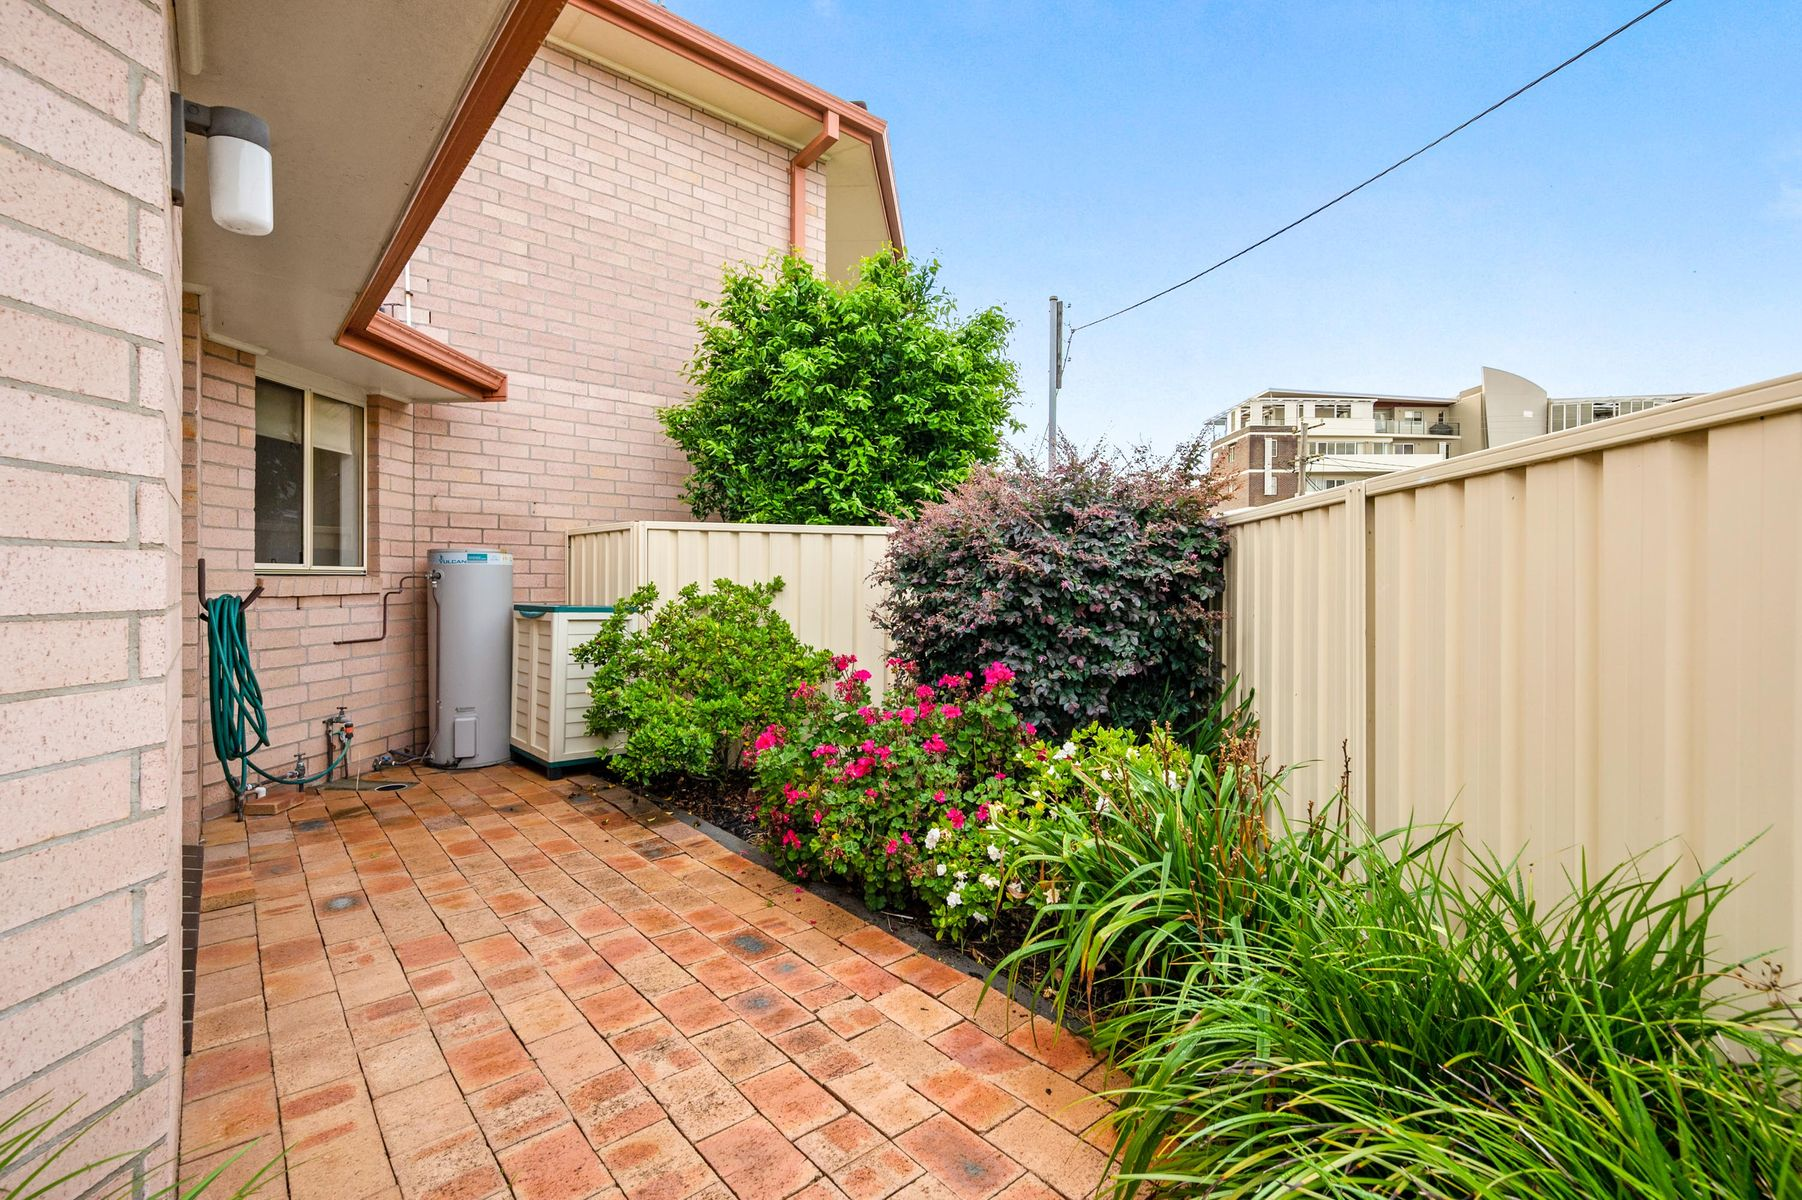 5/57 Maude Street, Belmont, NSW 2280